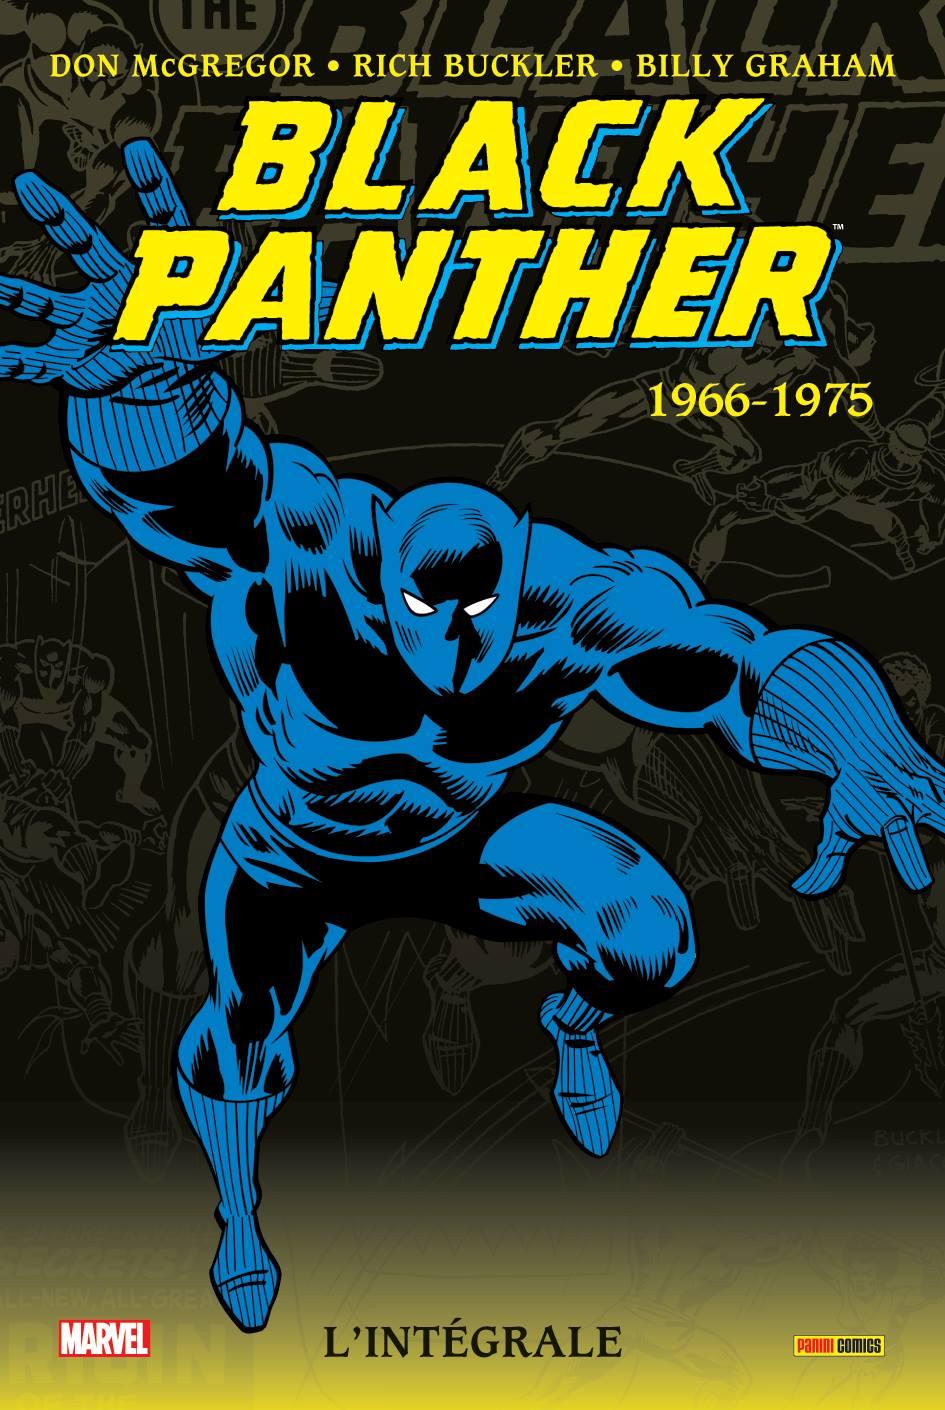 BLACK PANTHER : L'INTEGRALE 1966-1975